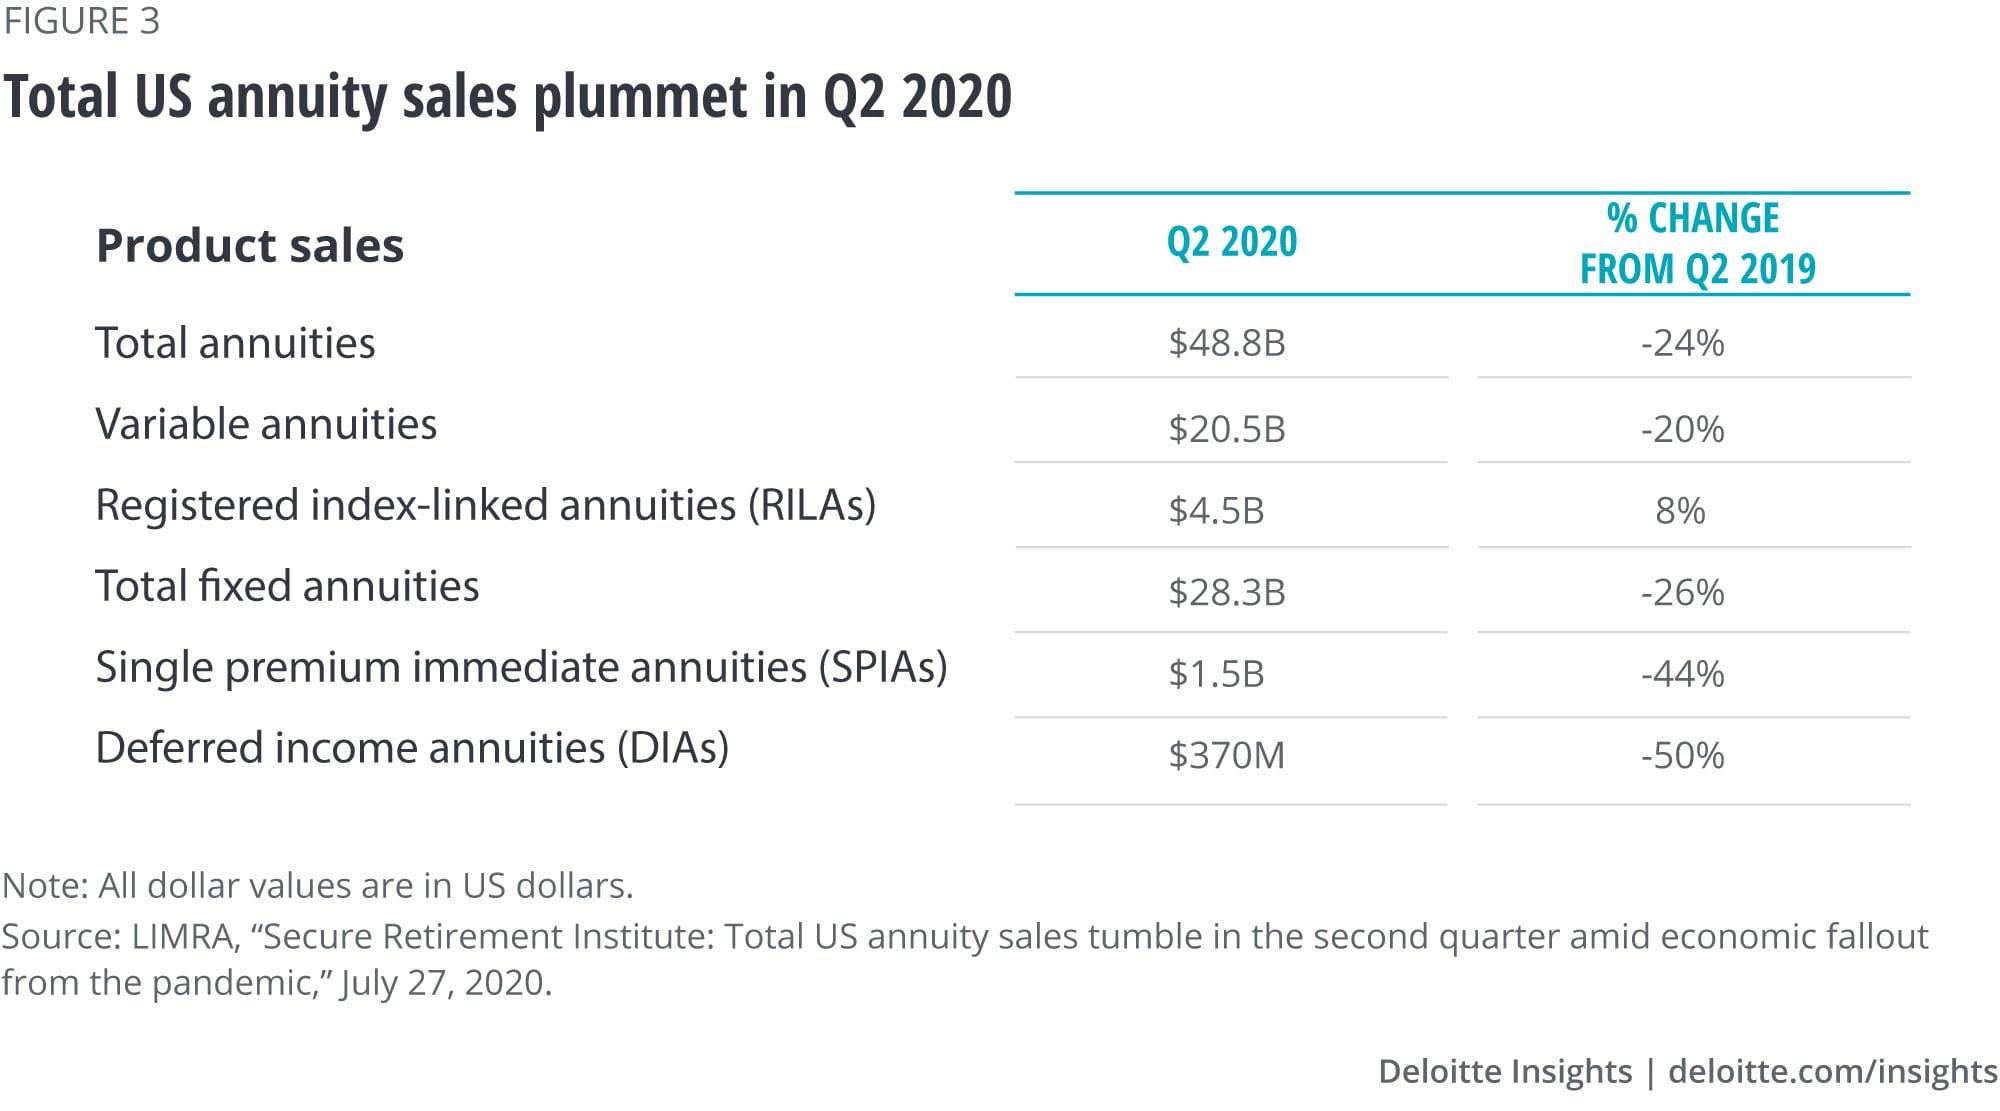 Total annuity sales plummet in Q2 2020